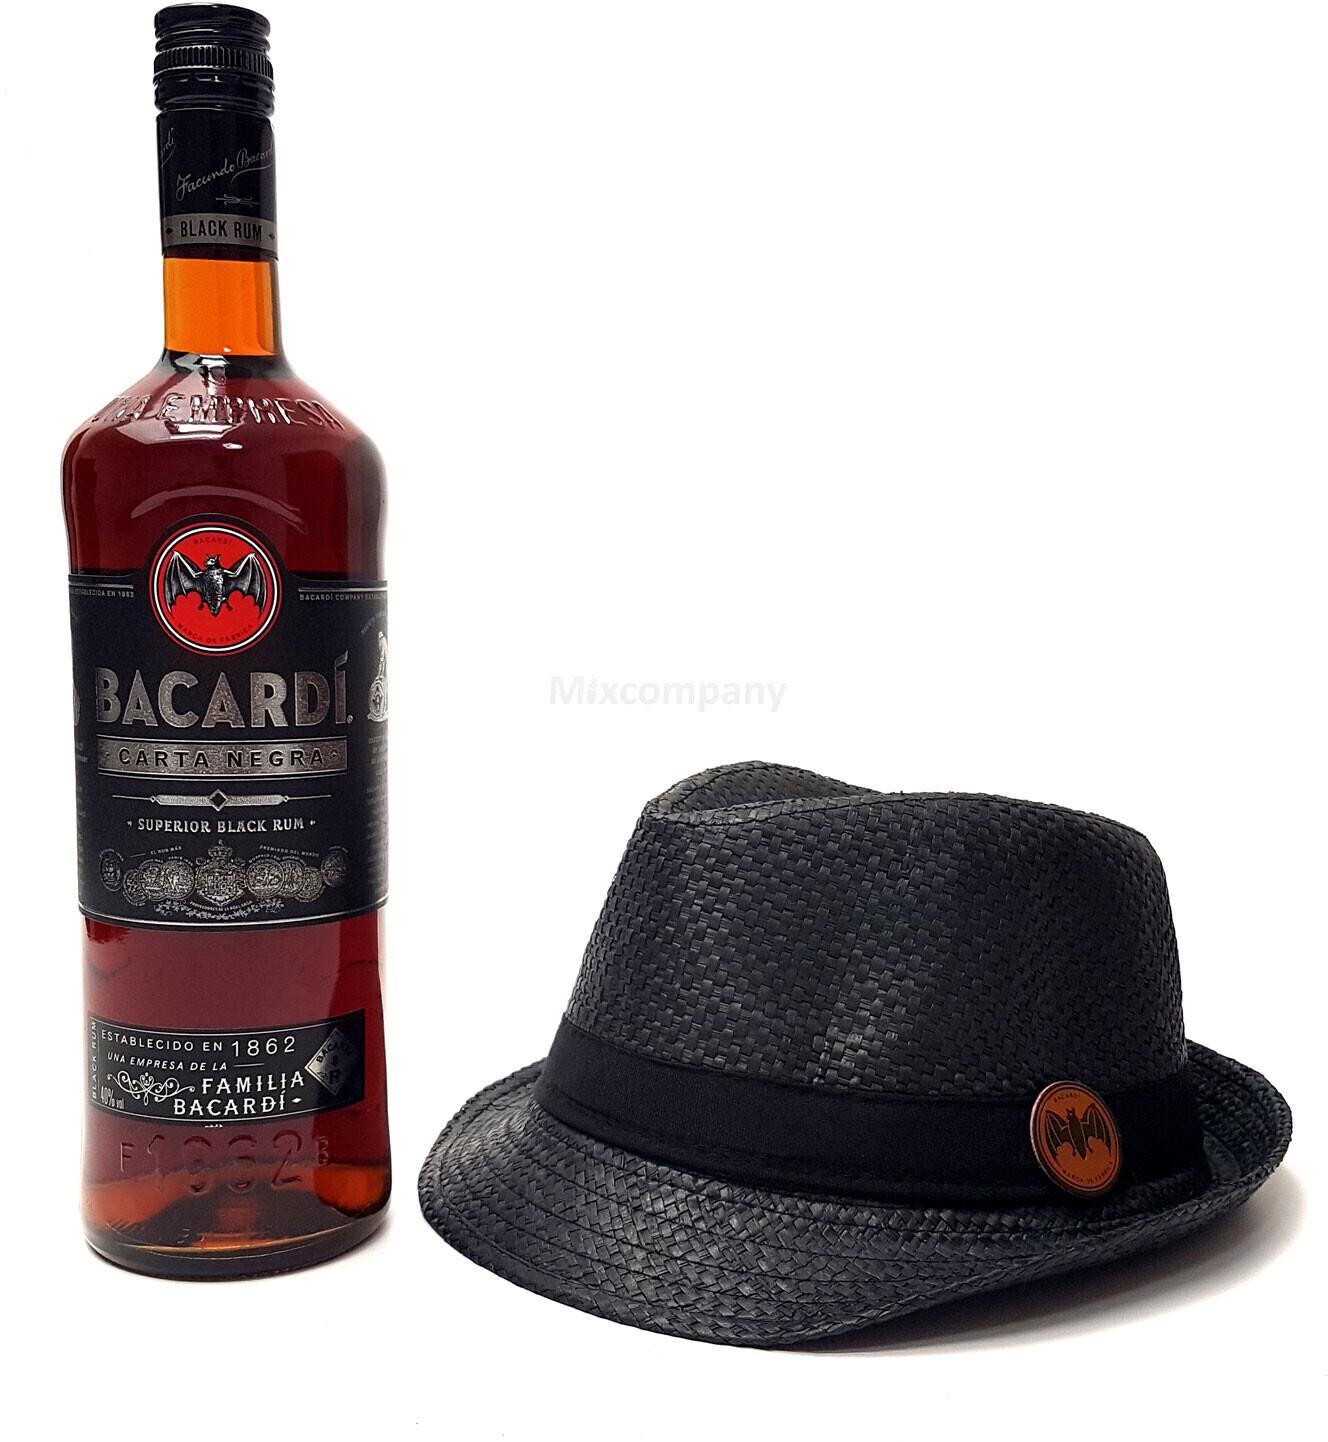 Bacardi Carta Negra Rum (0,7l) 700ml (40% Vol) + Strohhut schwarz